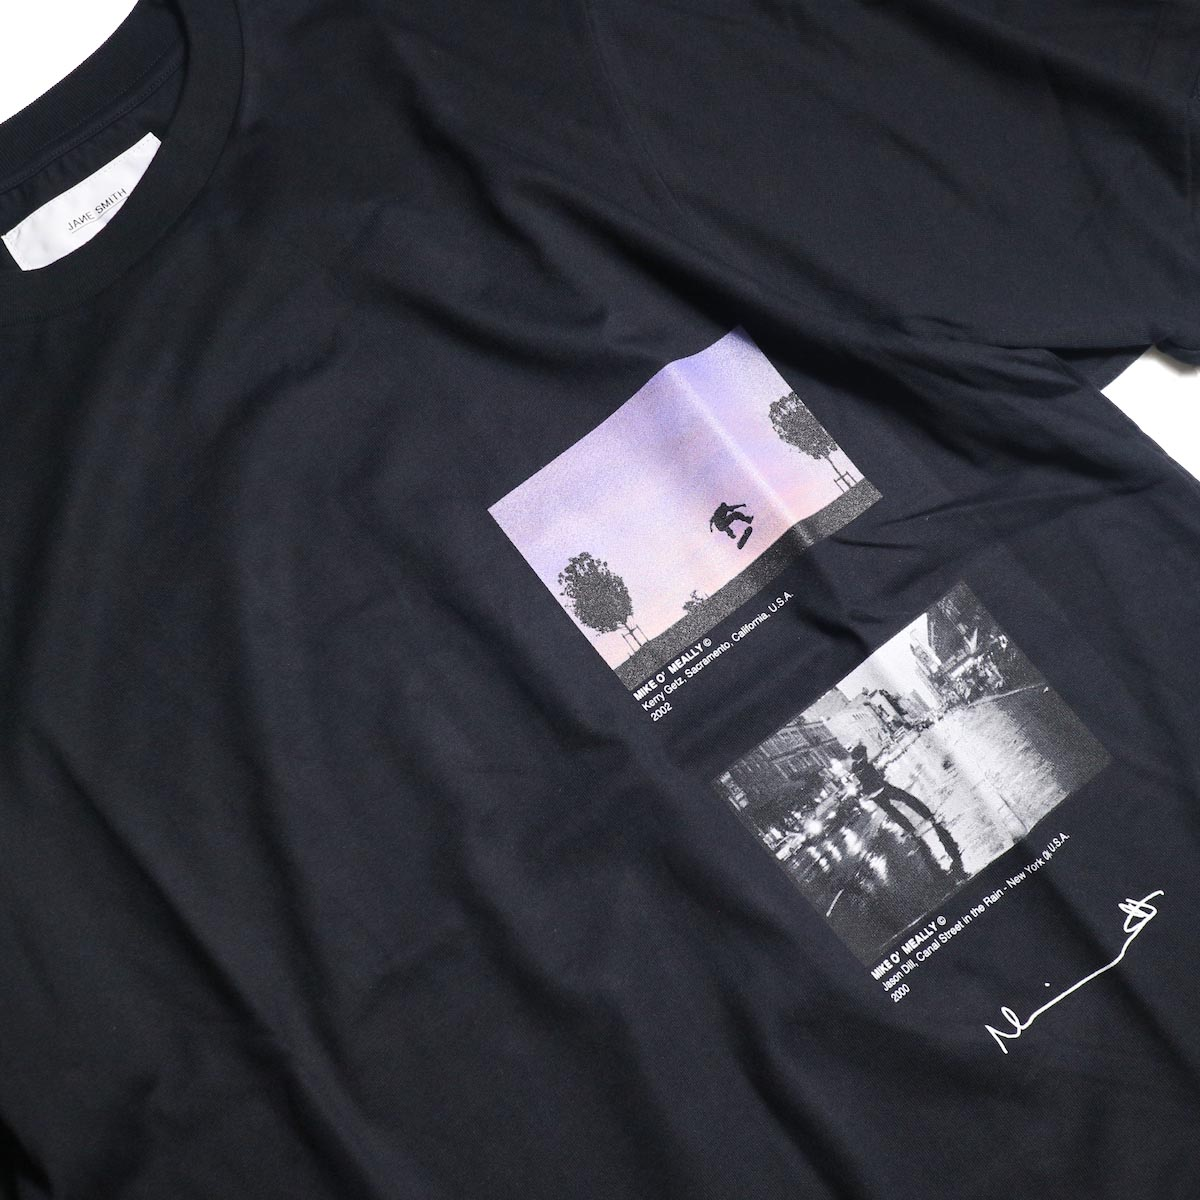 JANE SMITH / Print Tee (KERRY GETZ & JASON DULL,CANAL STREET IN THE RAIN S/S) -Blackプリント